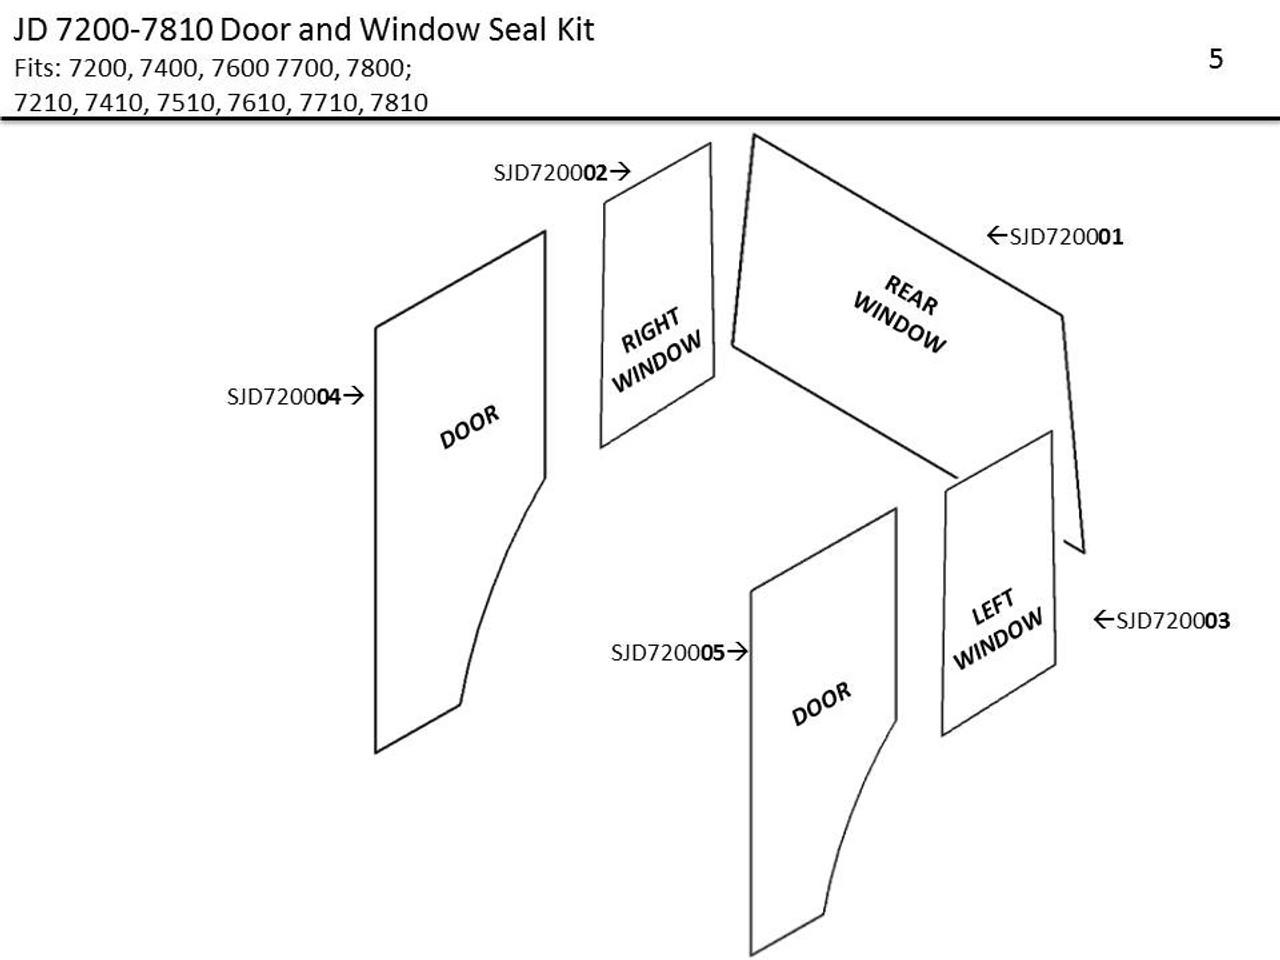 JD 7200-7810 DOOR AND WINDOW SEAL KIT on